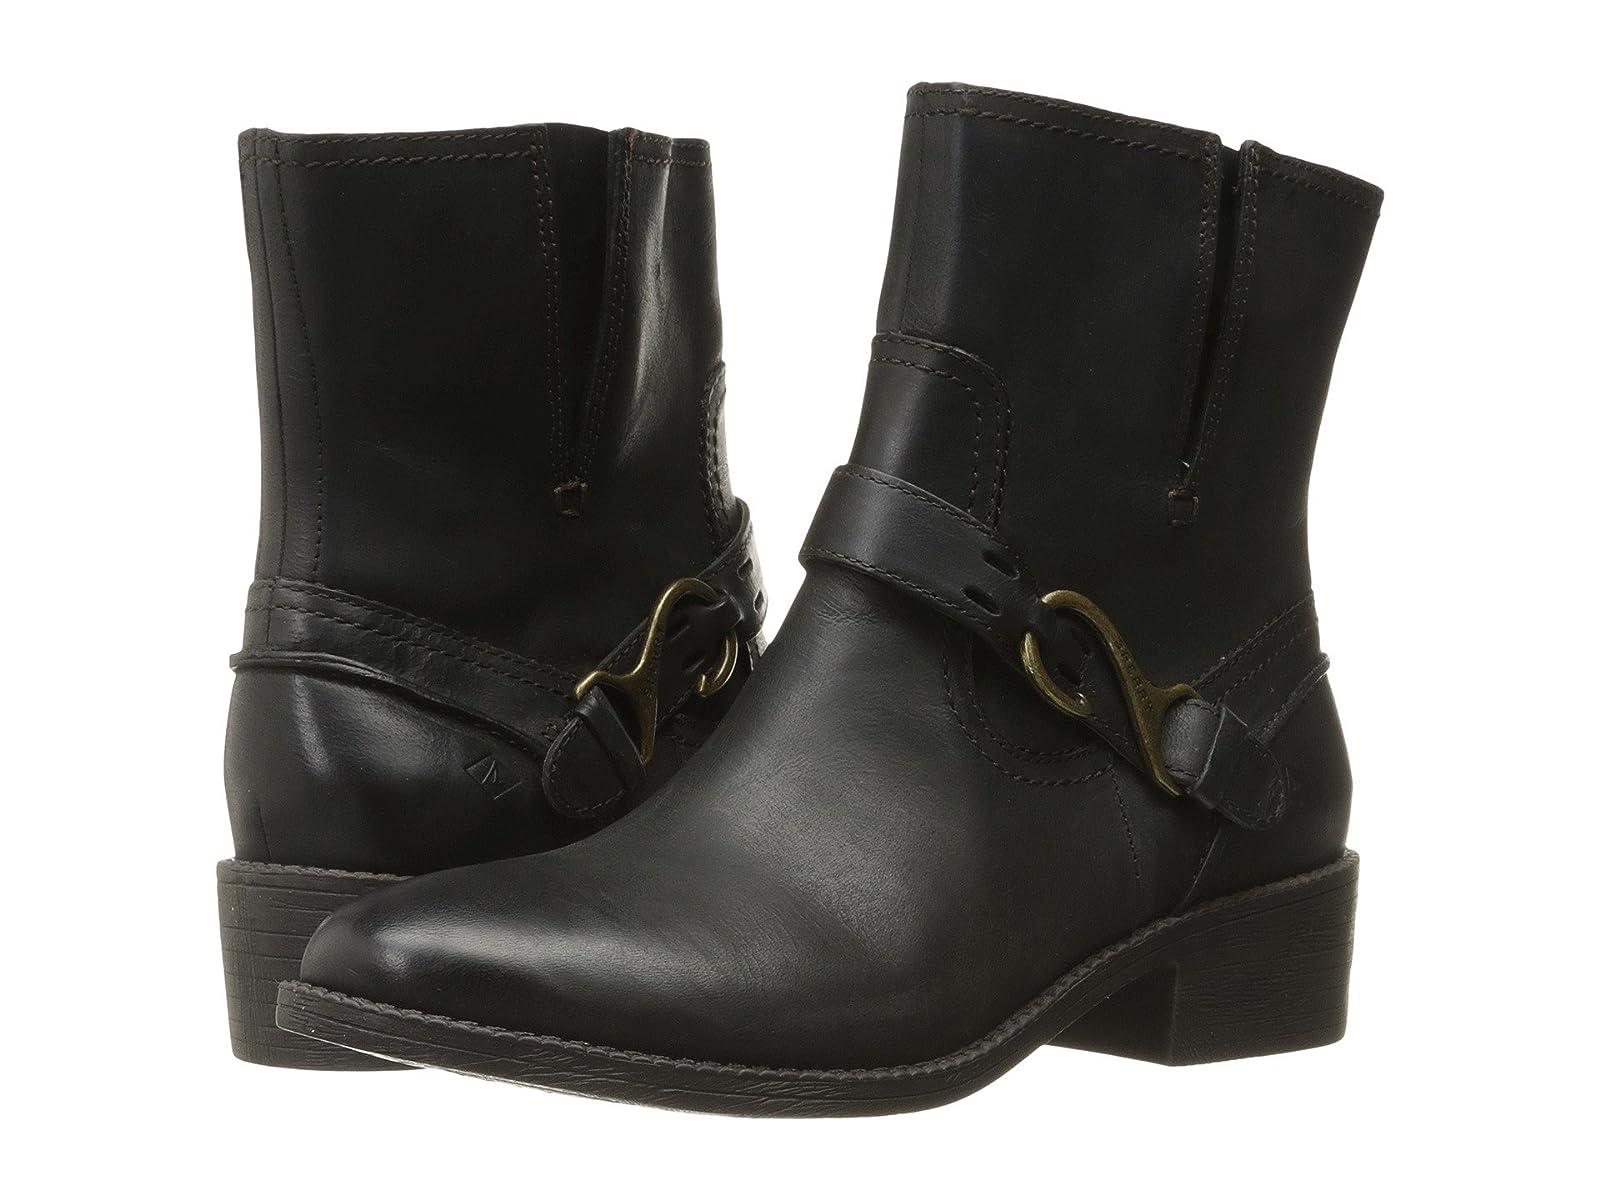 Sperry Juniper SeineCheap and distinctive eye-catching shoes